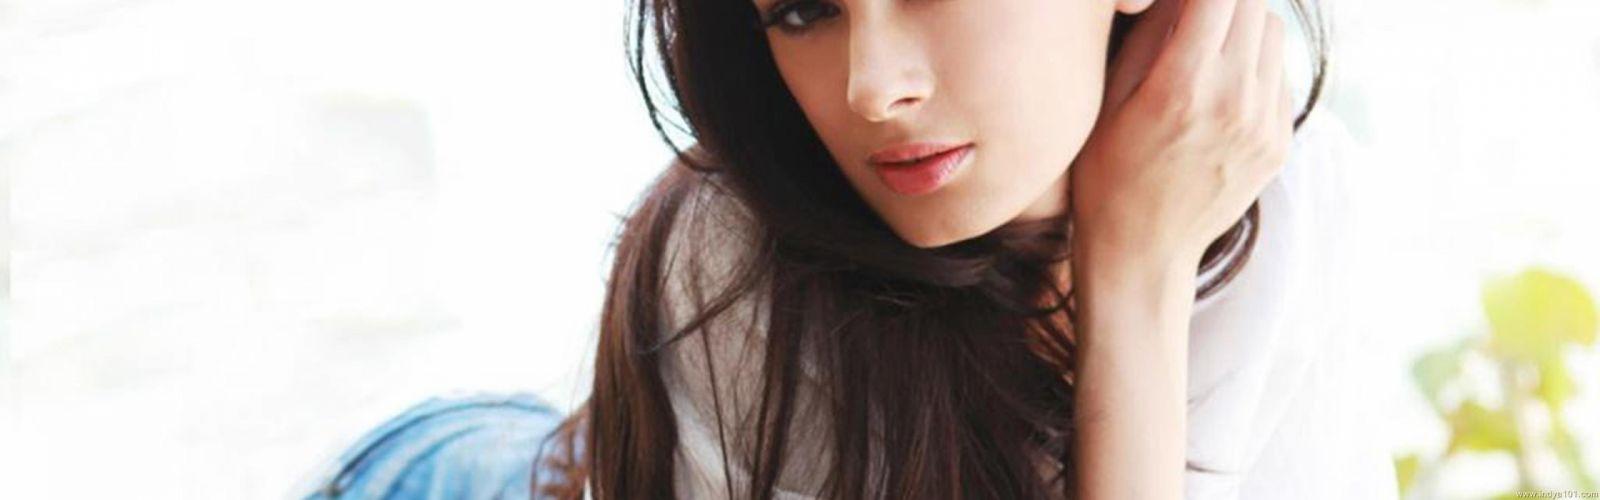 EVELYN SHARMA german indian actress model babe (1) wallpaper